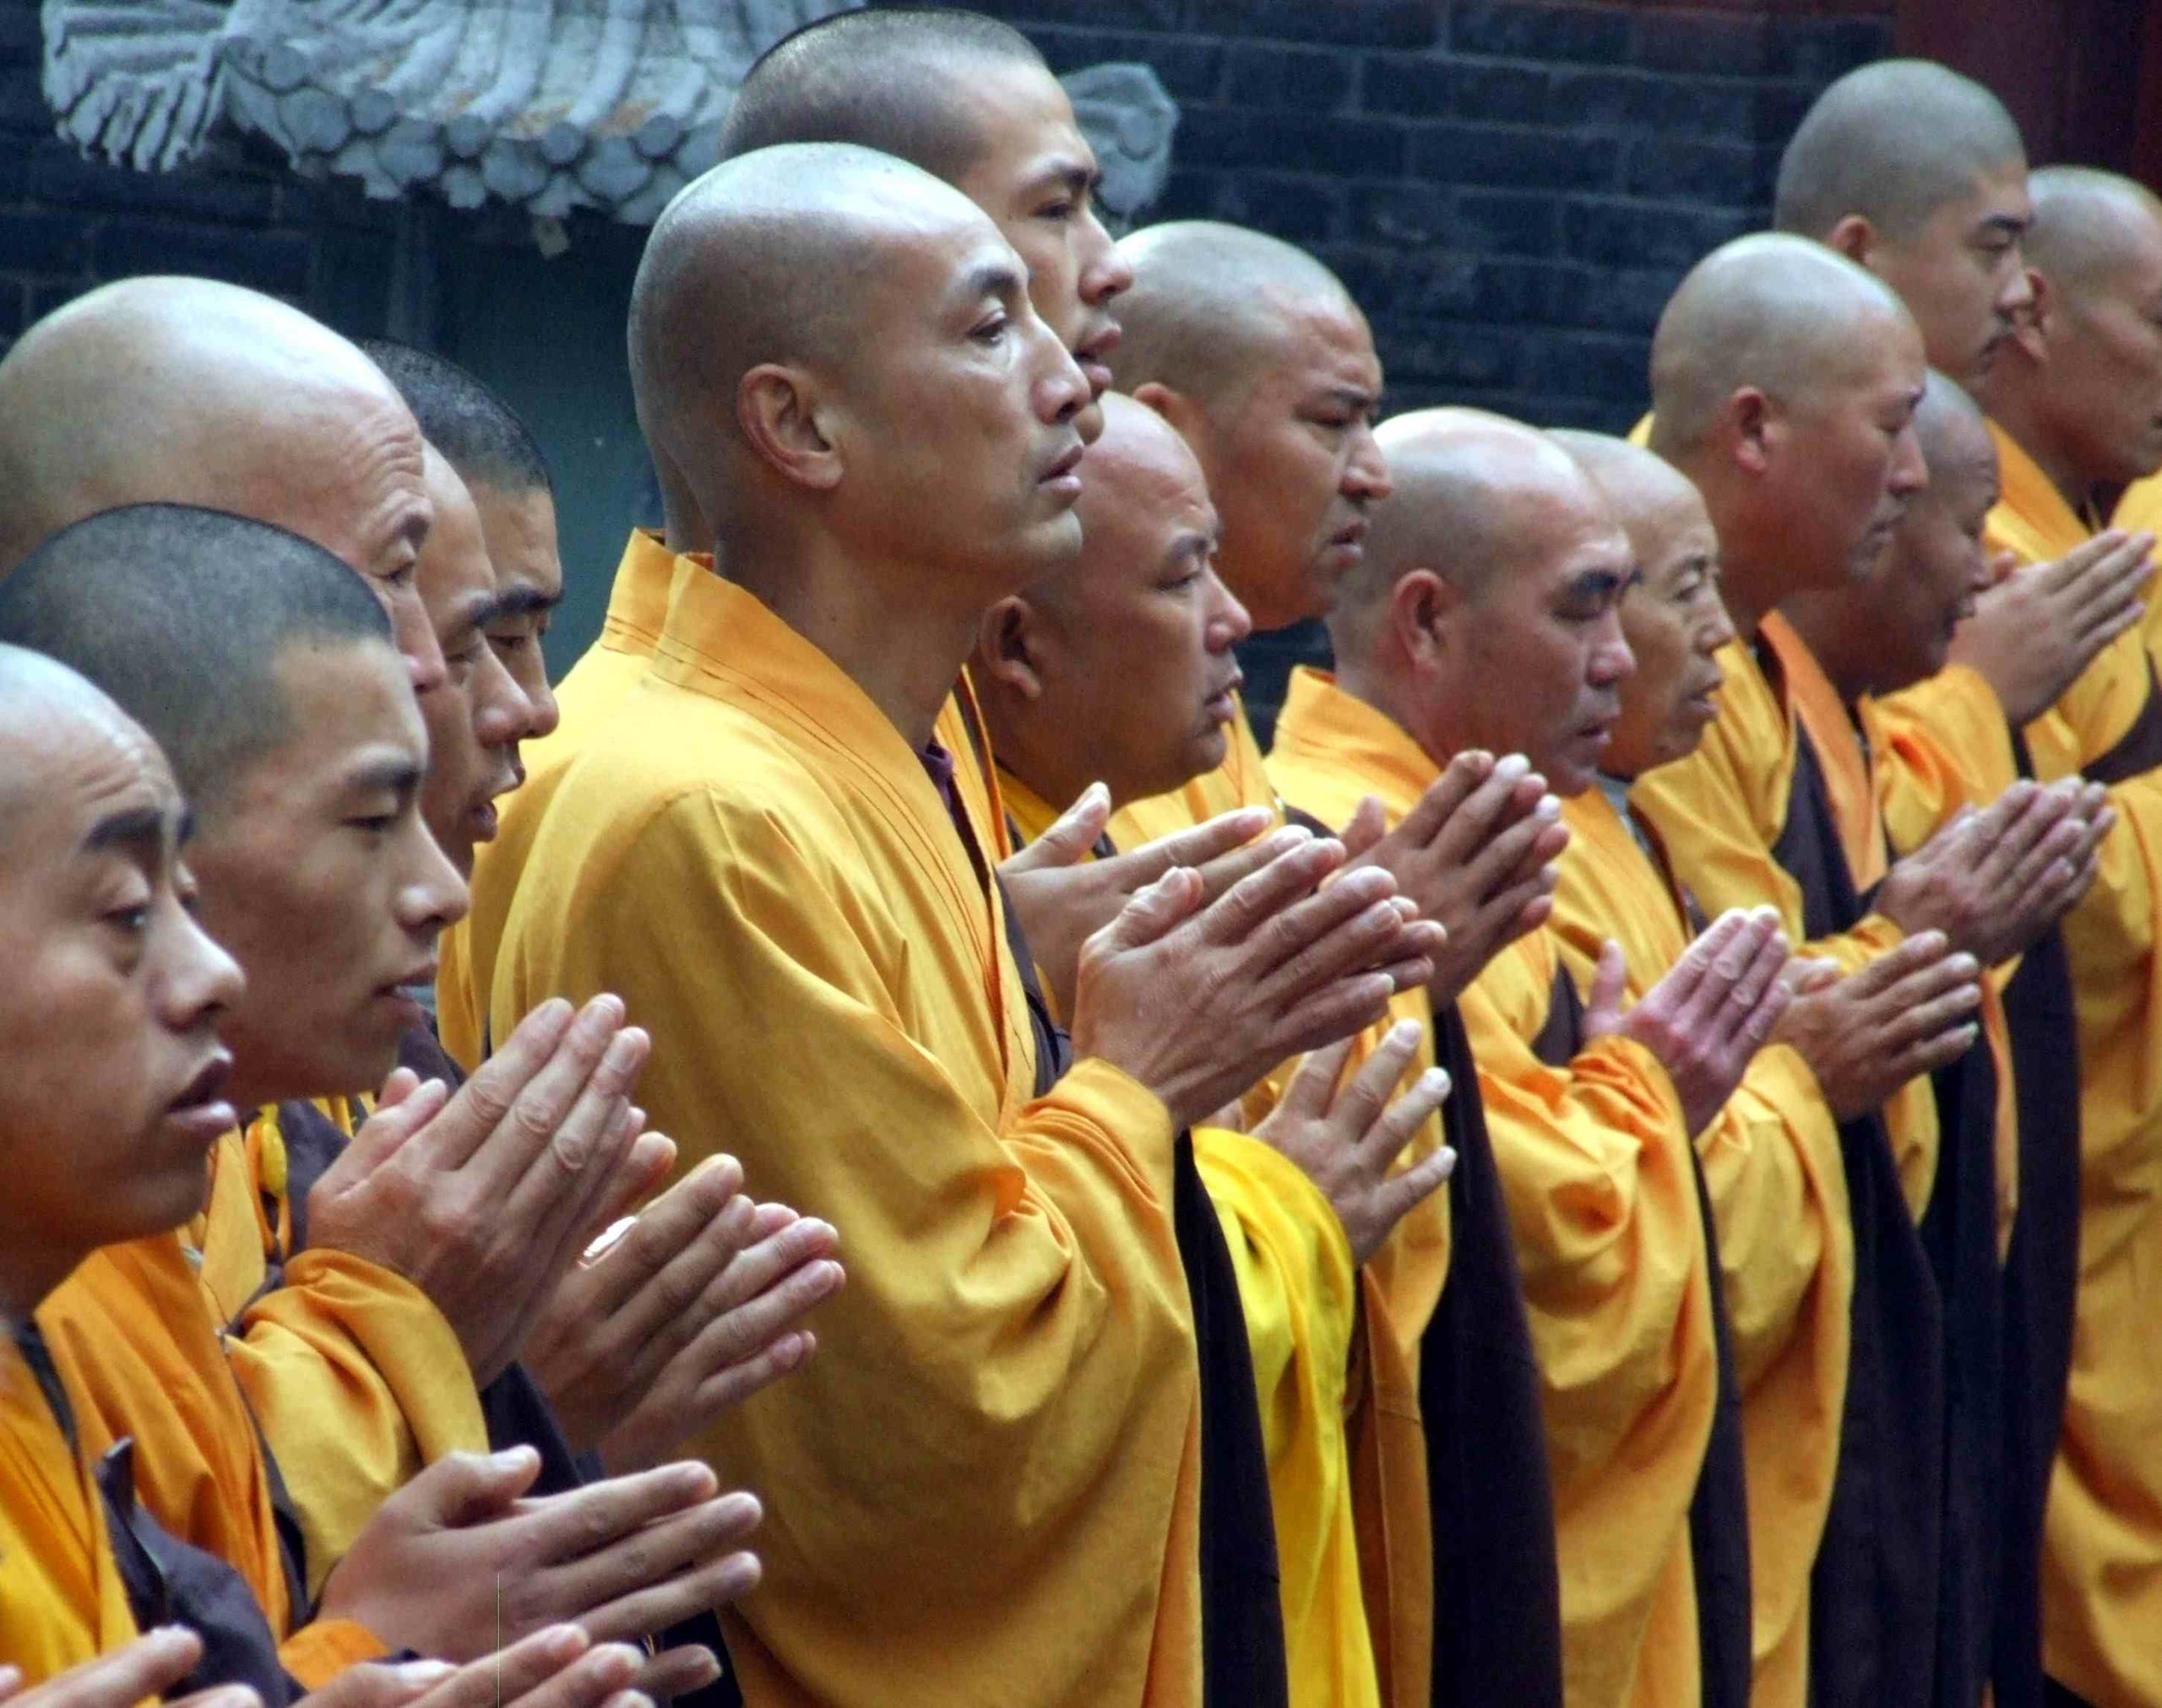 Buddhists traditions